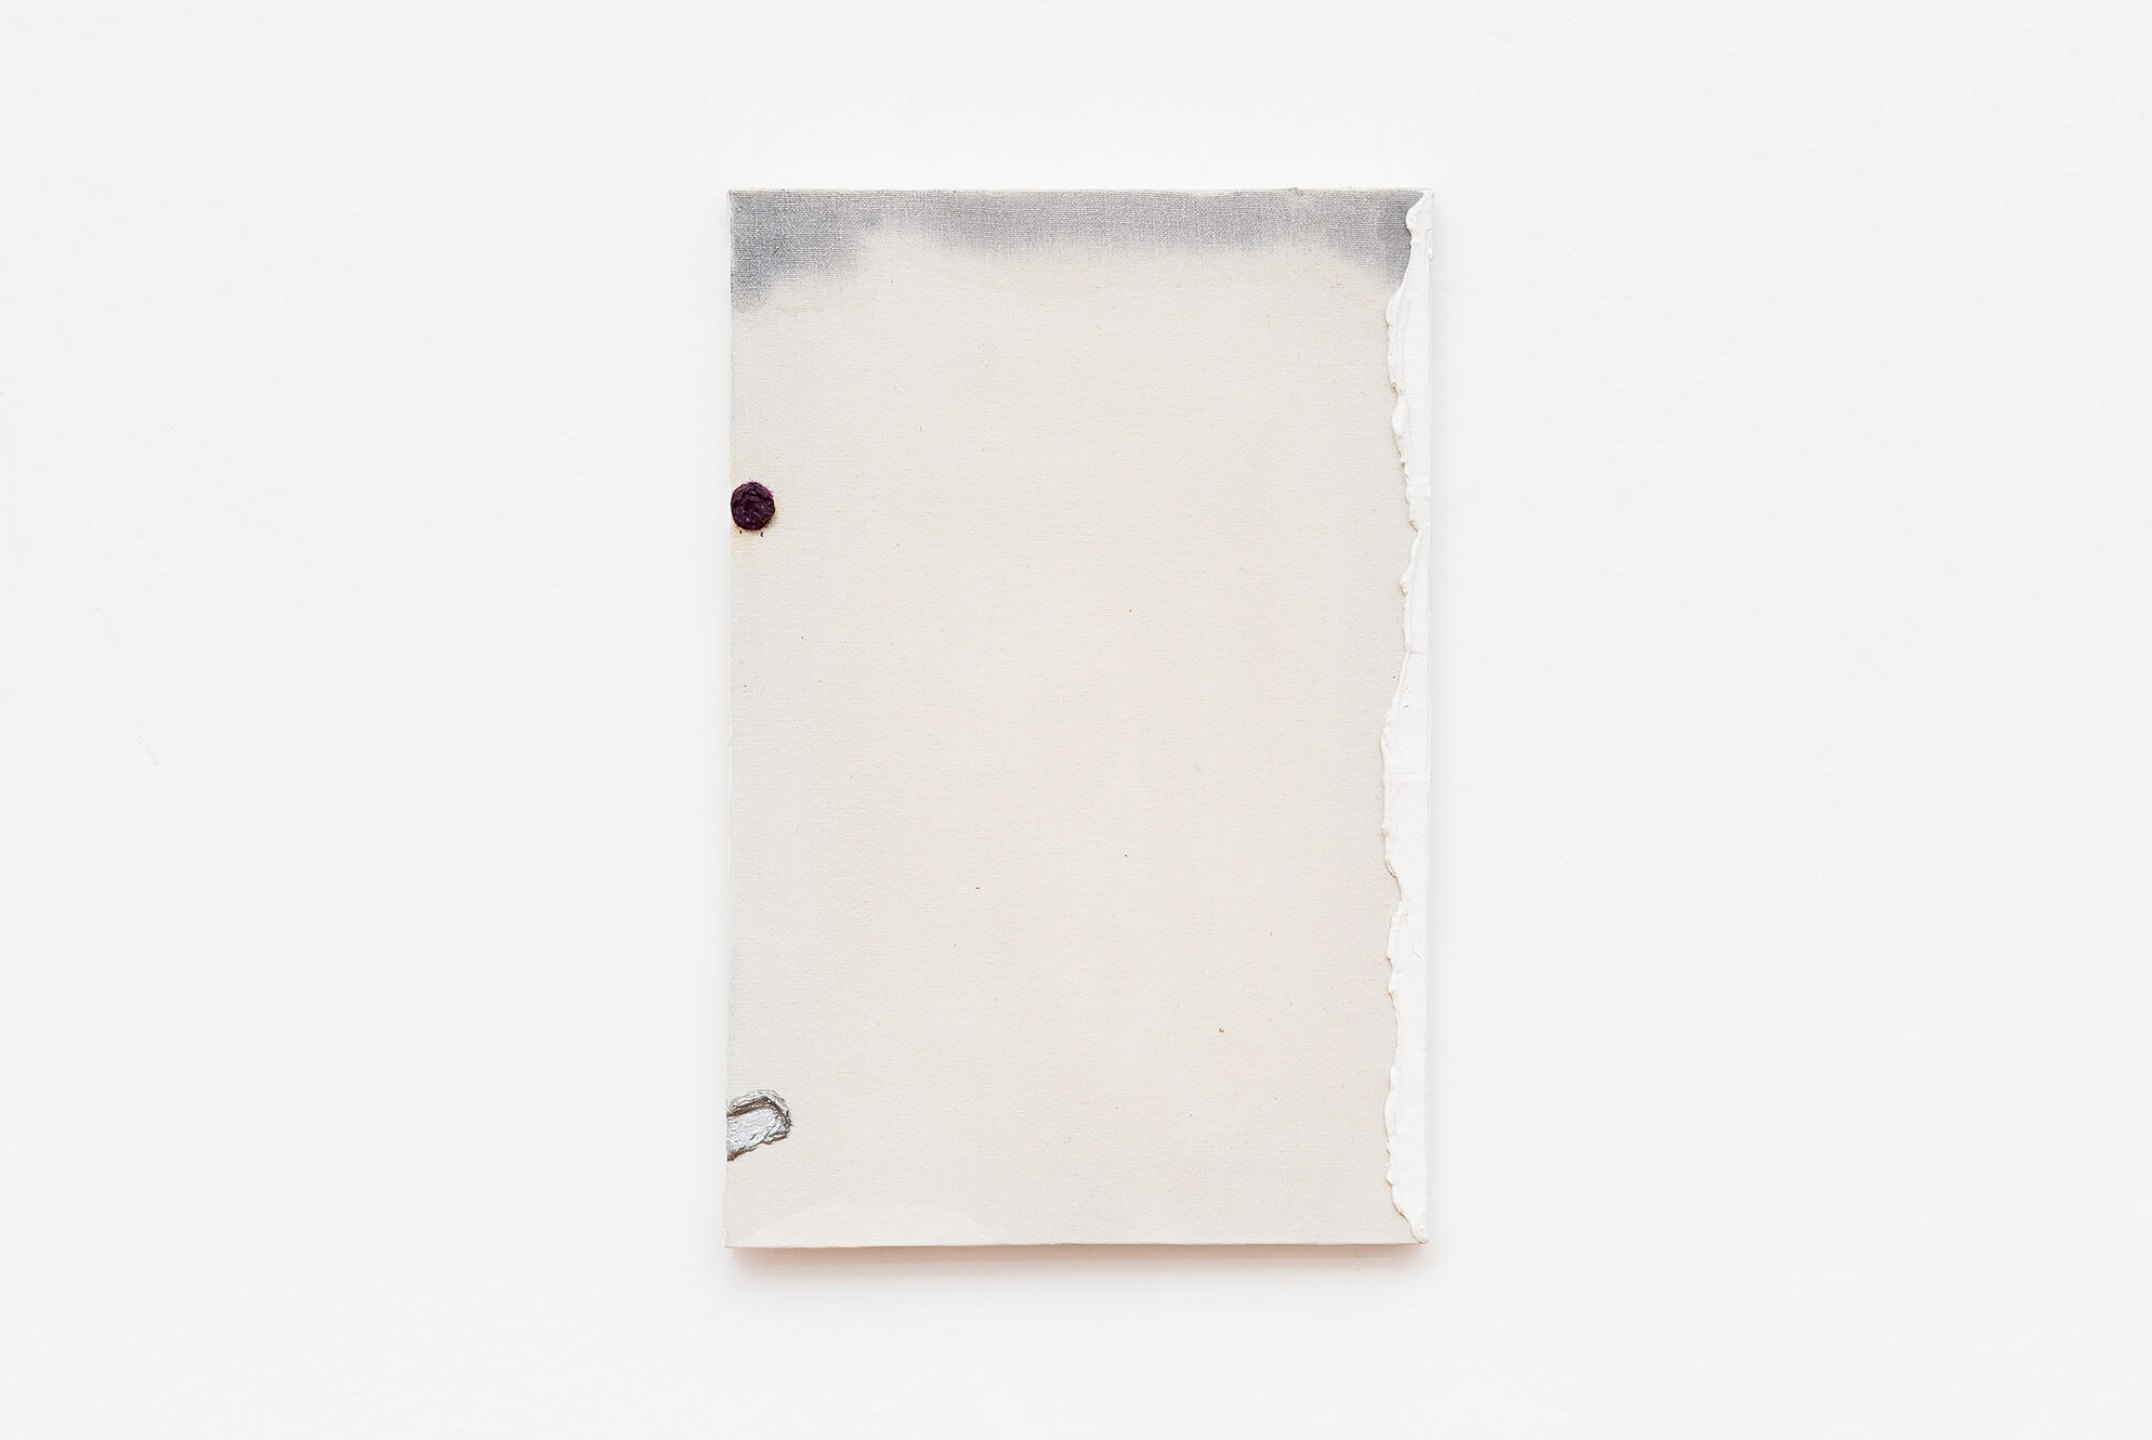 Paulo Monteiro, <em>untitled,</em>2012, oil on canvas, 30 × 20 cm - Mendes Wood DM